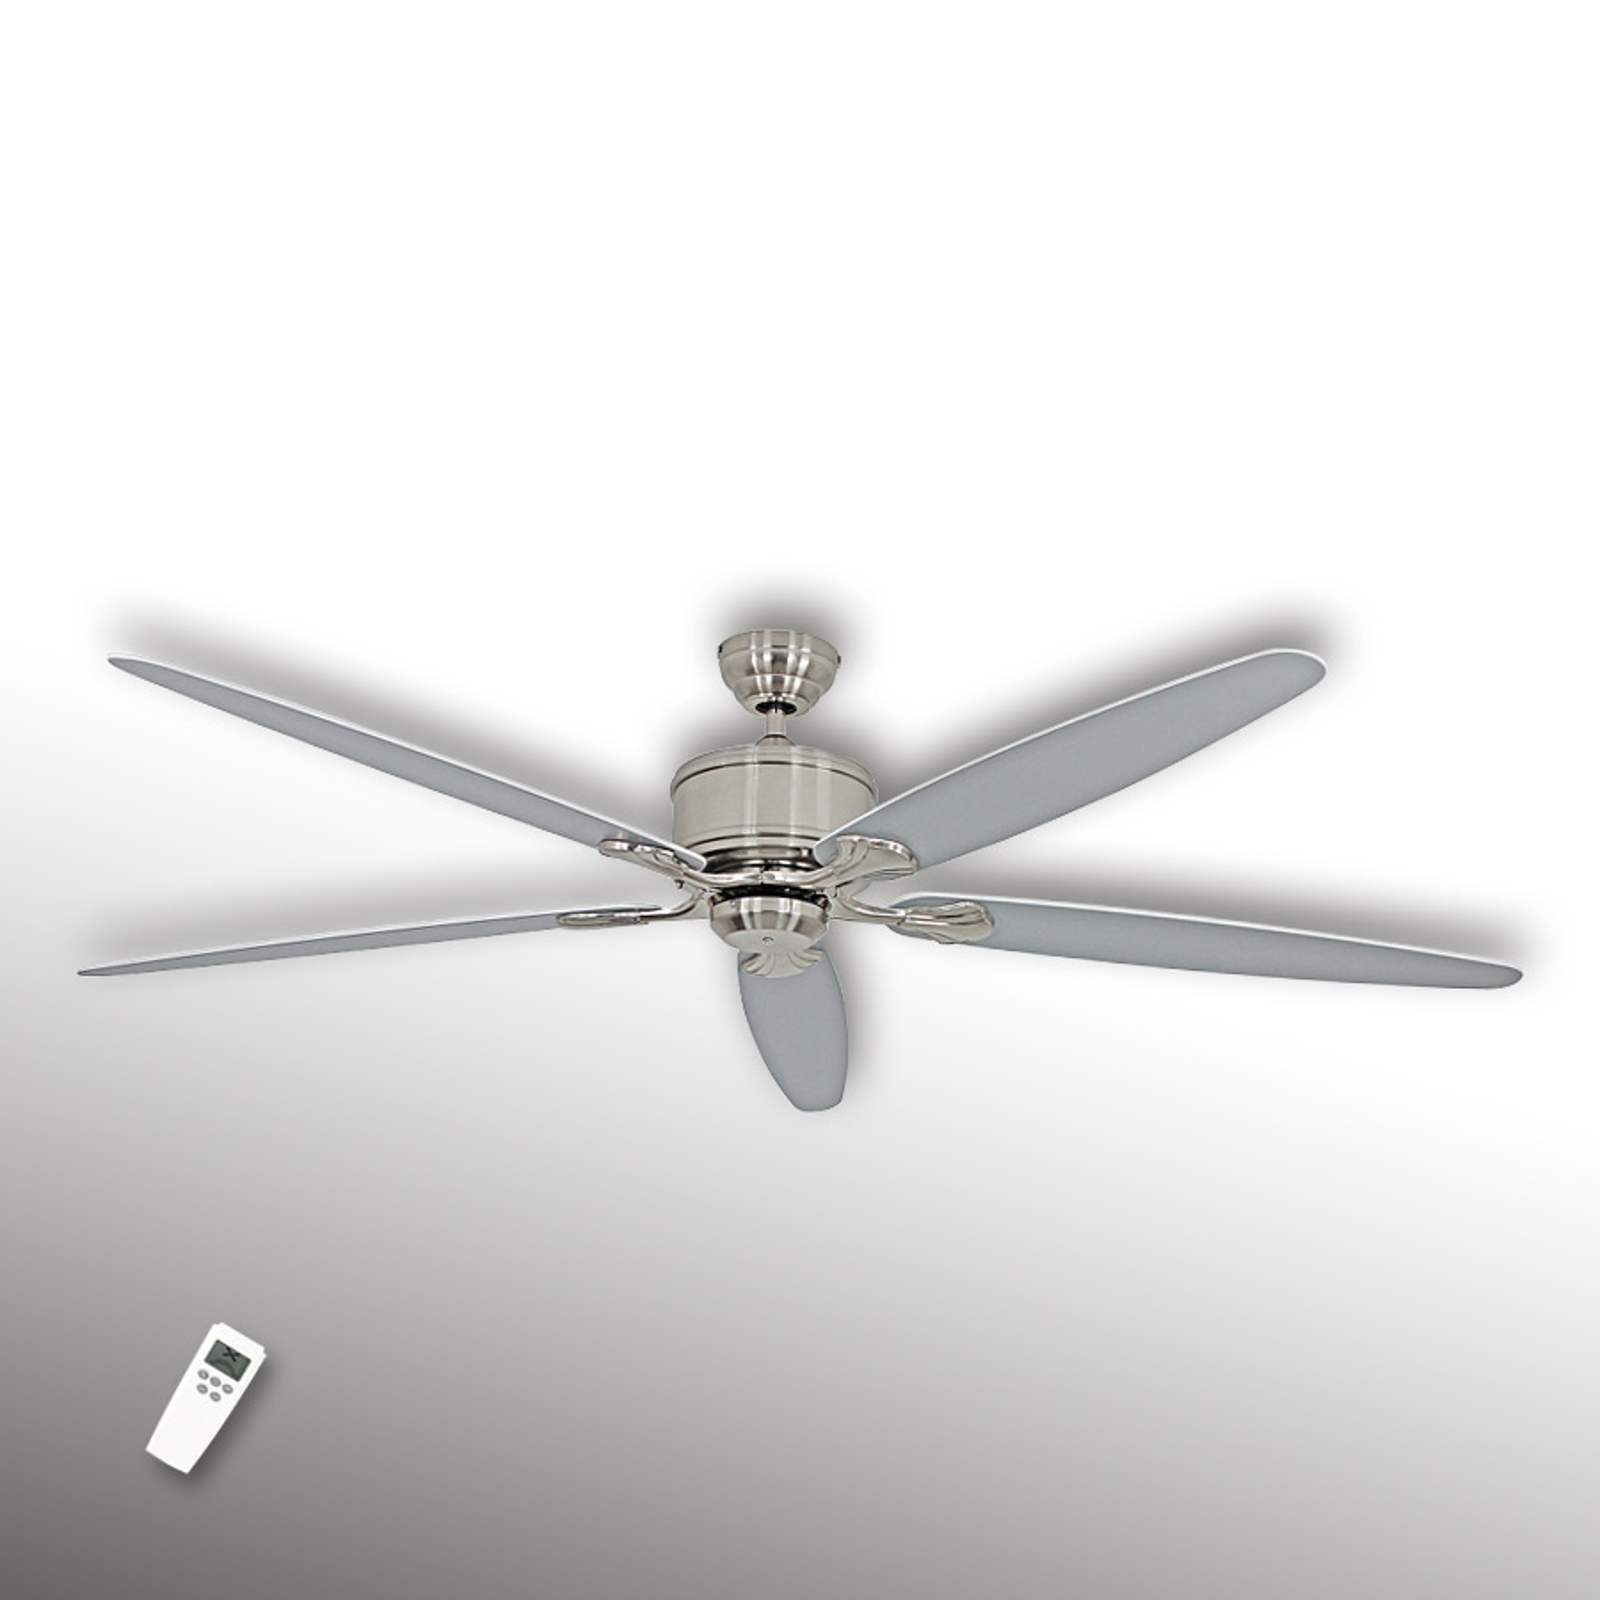 Sparsom loftsventilator Eco Elements, krom